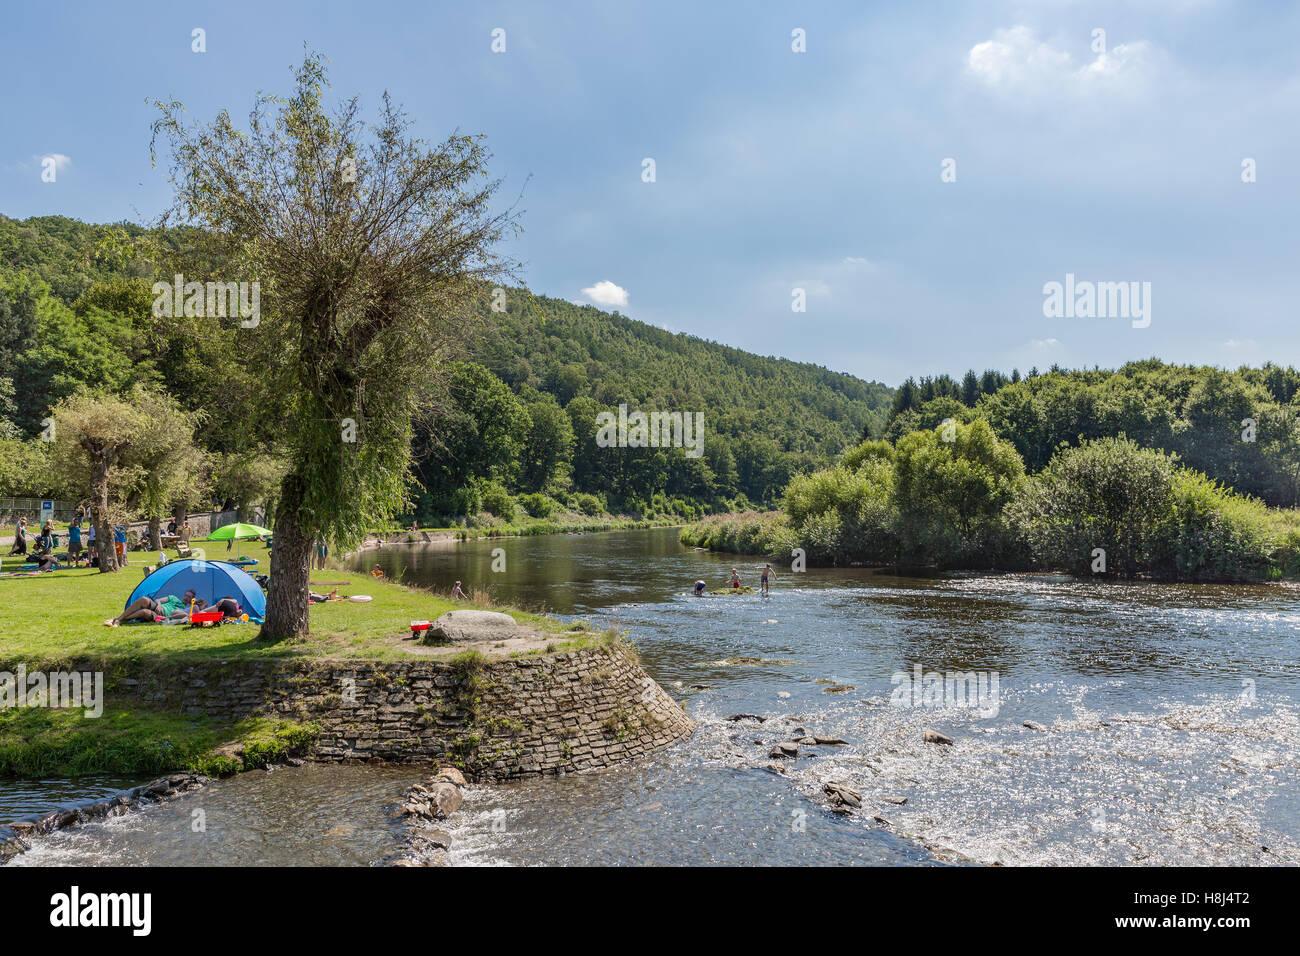 Recreating people near the riverbank at the river Semois, Belgium - Stock Image